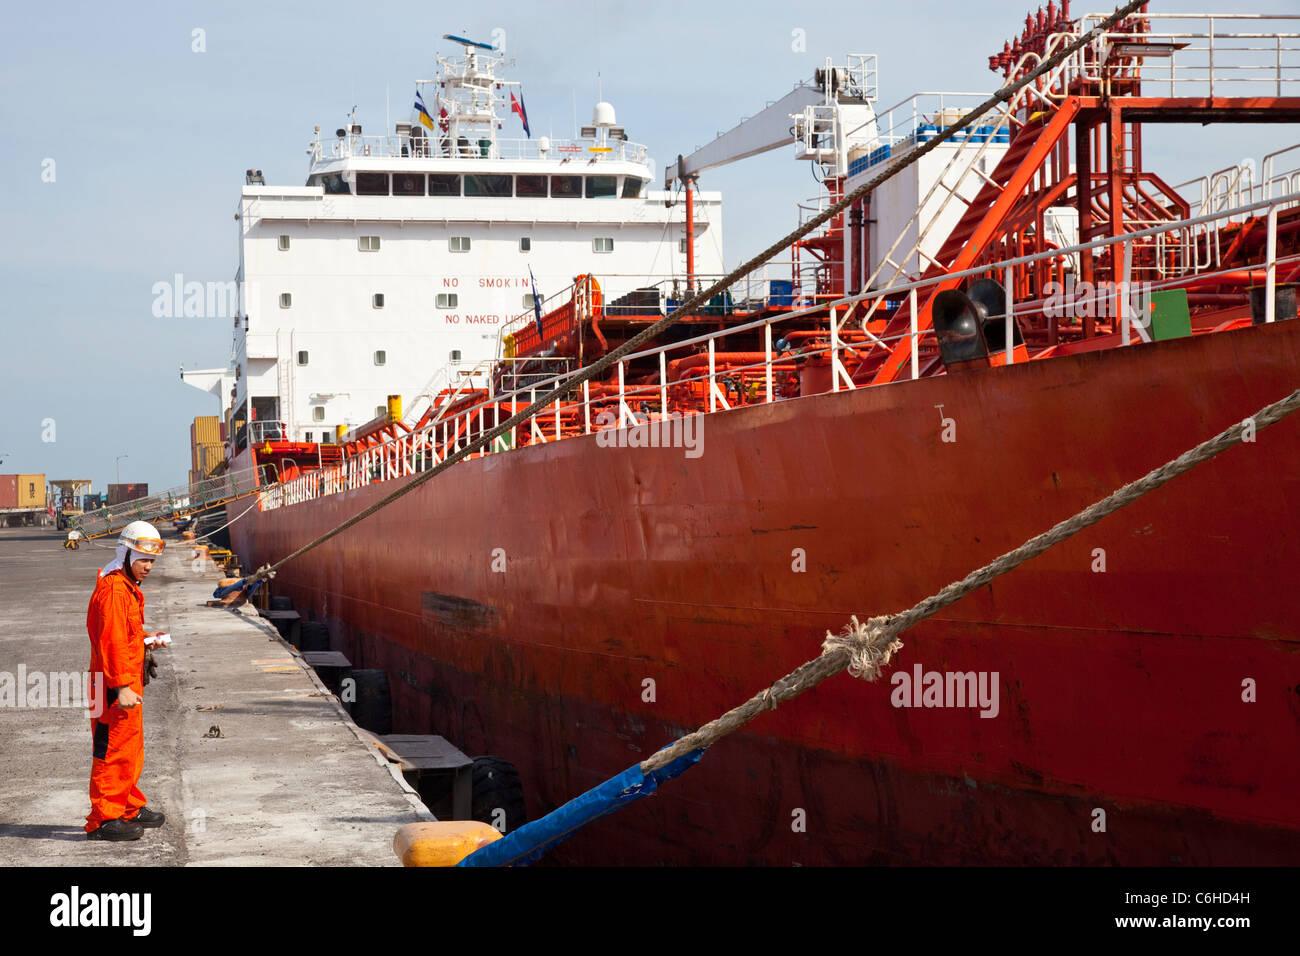 Ethanol tanker ship 'Bright World' at port in San Salvador, El Salvador - Stock Image